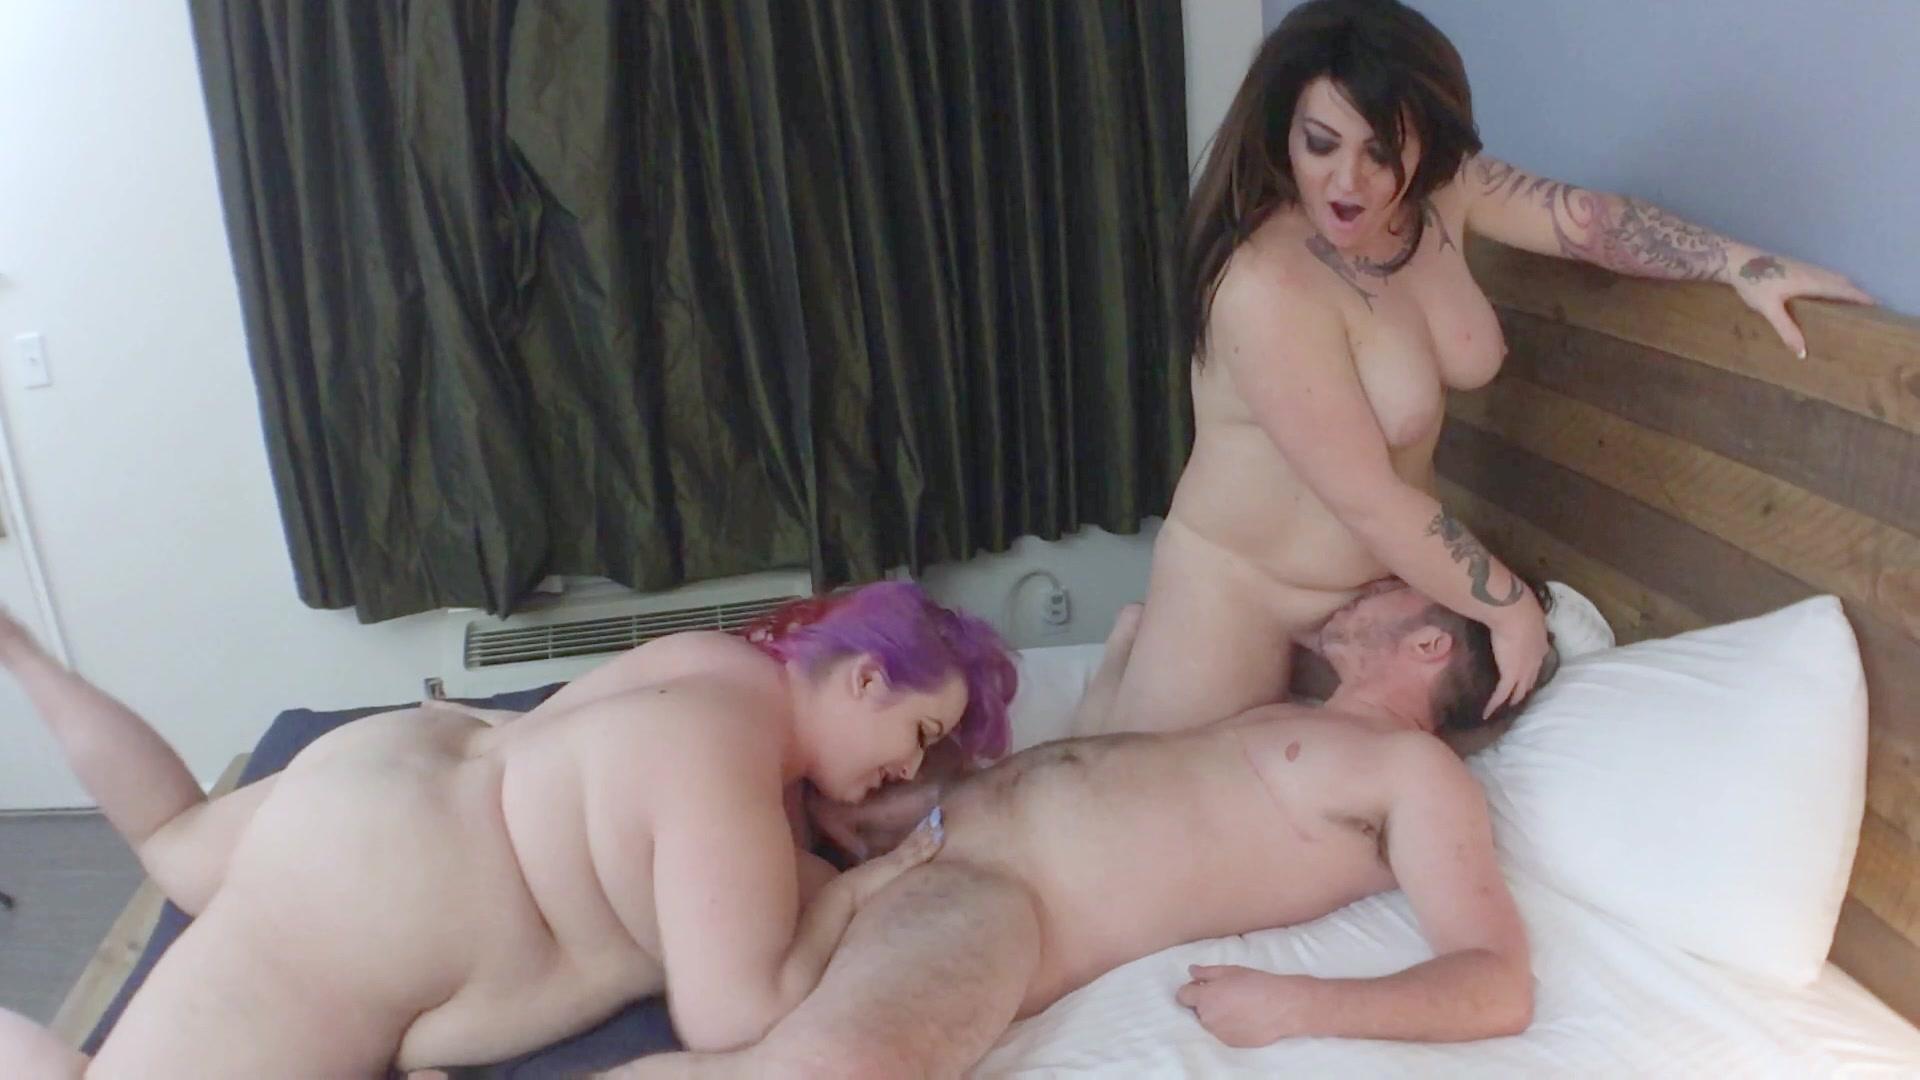 Pansexual Porn